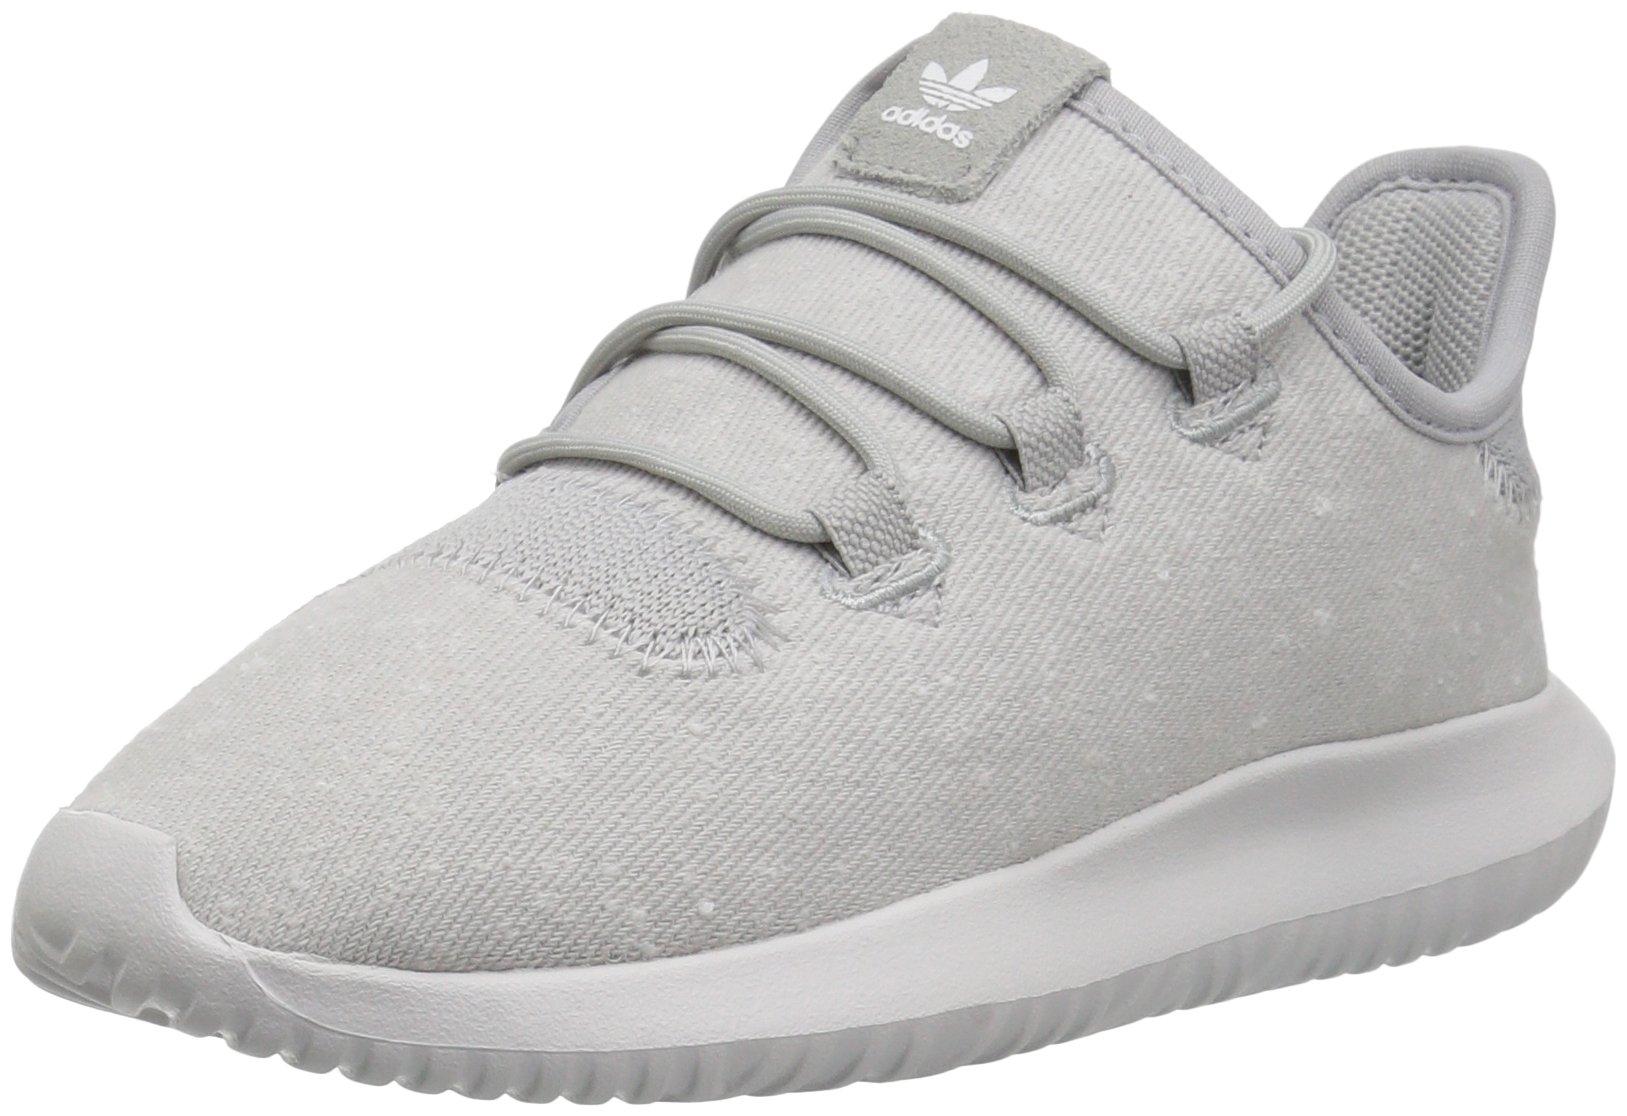 wholesale dealer f49cb 4b50a adidas Originals Boys' Tubular Shadow C Running Shoe, Grey Two Crystal  White, 2 Medium US Little Kid